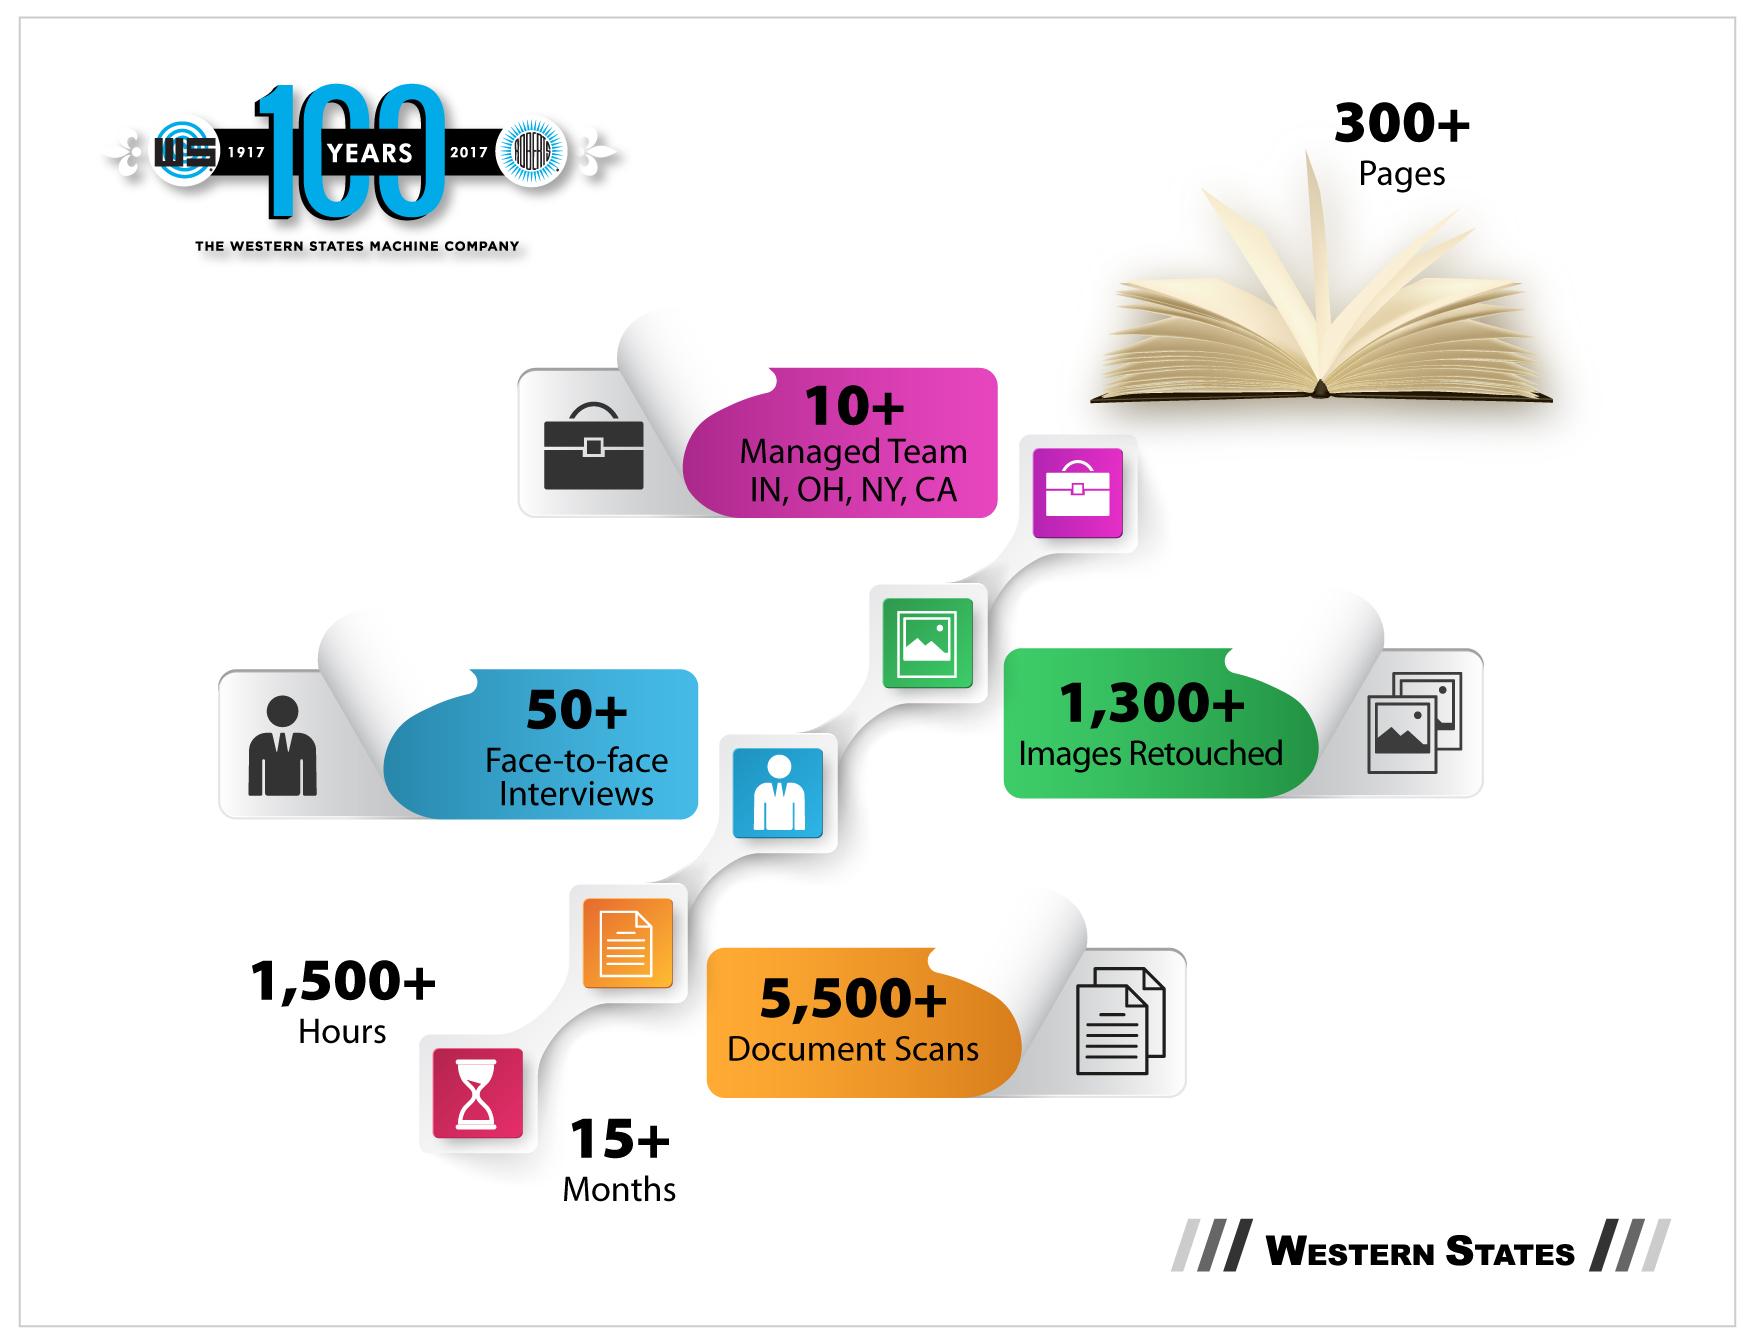 Buckaroo Marketing - Western States Anniversary Book Case Study